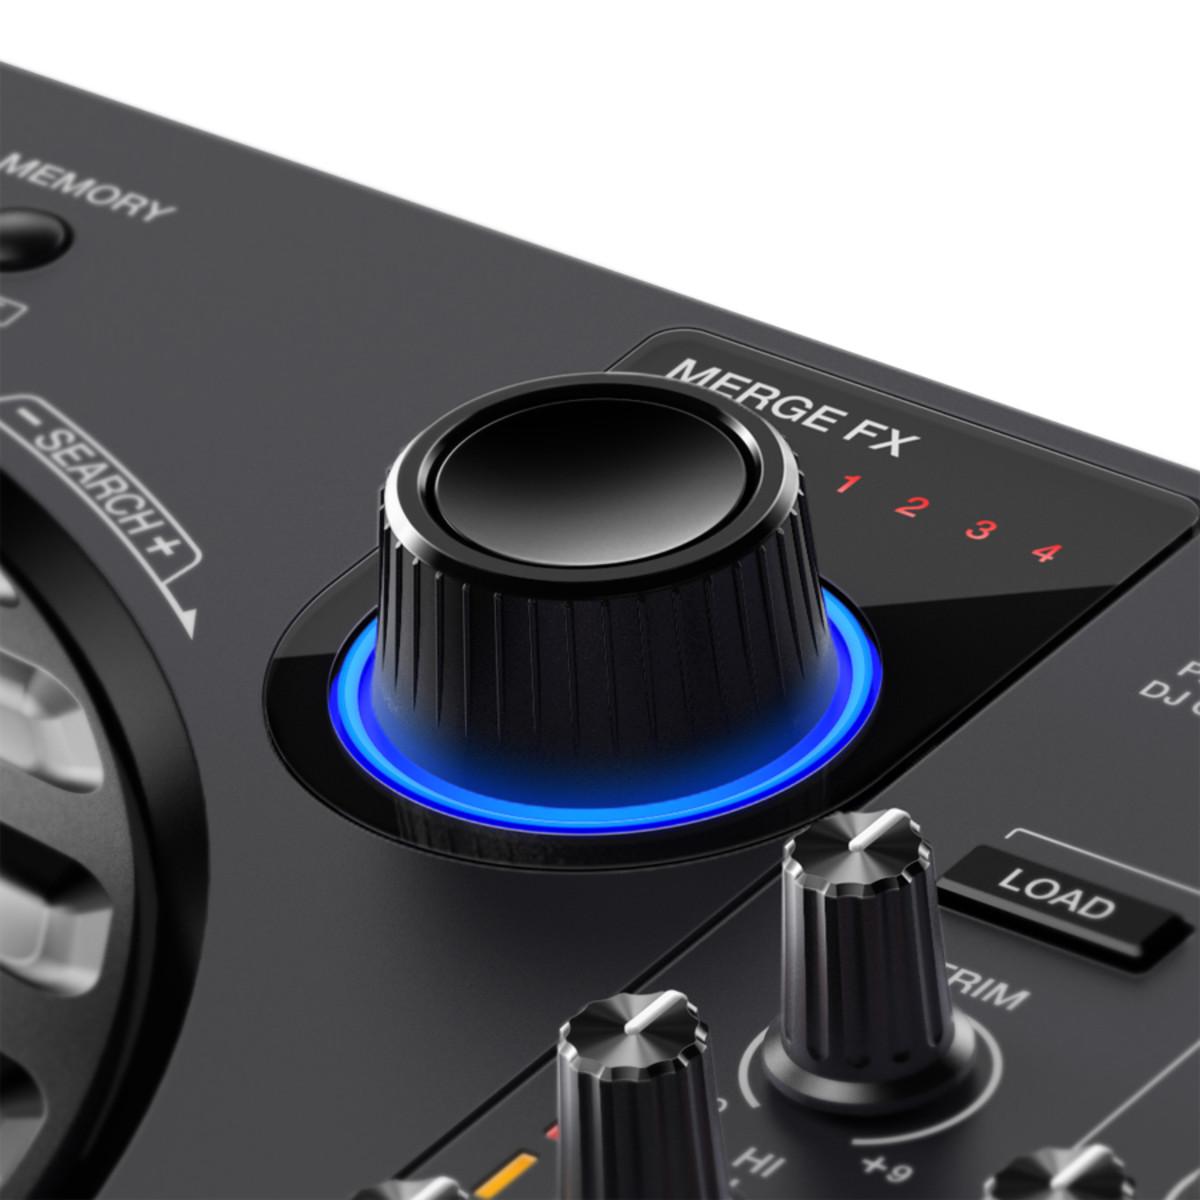 Merge FX knob